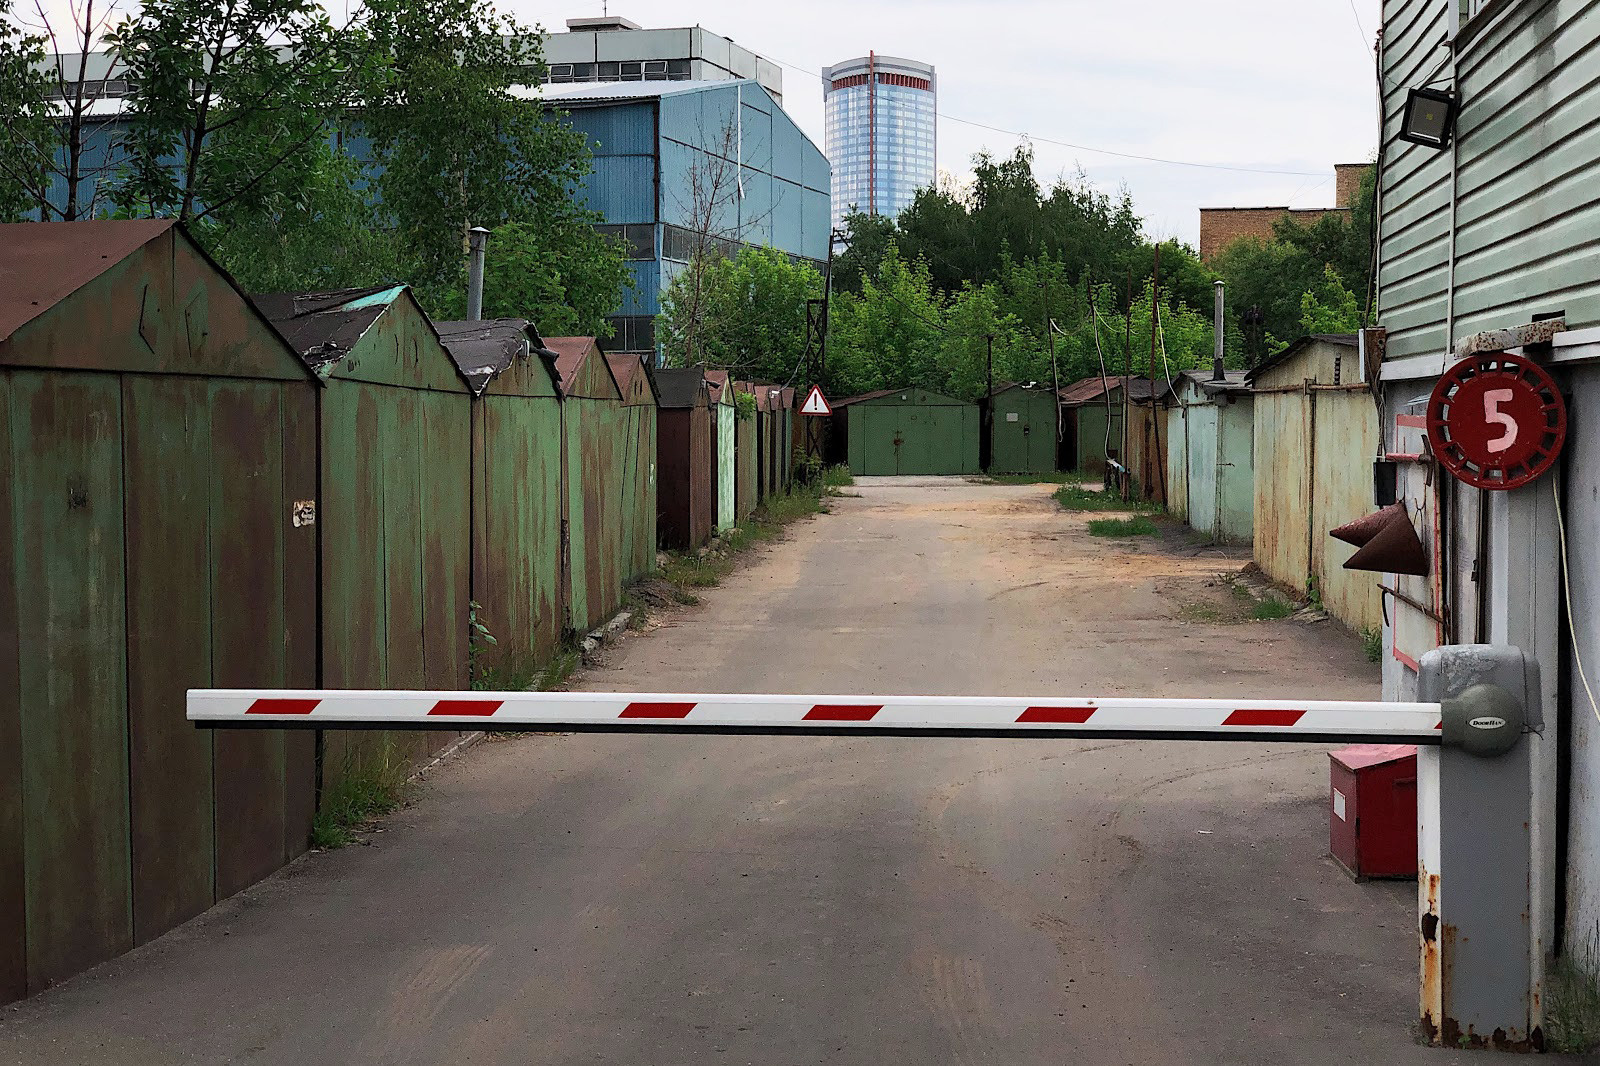 Улица Маршала Шапошникова, гаражный кооператив при заводе «Знамя Труда»